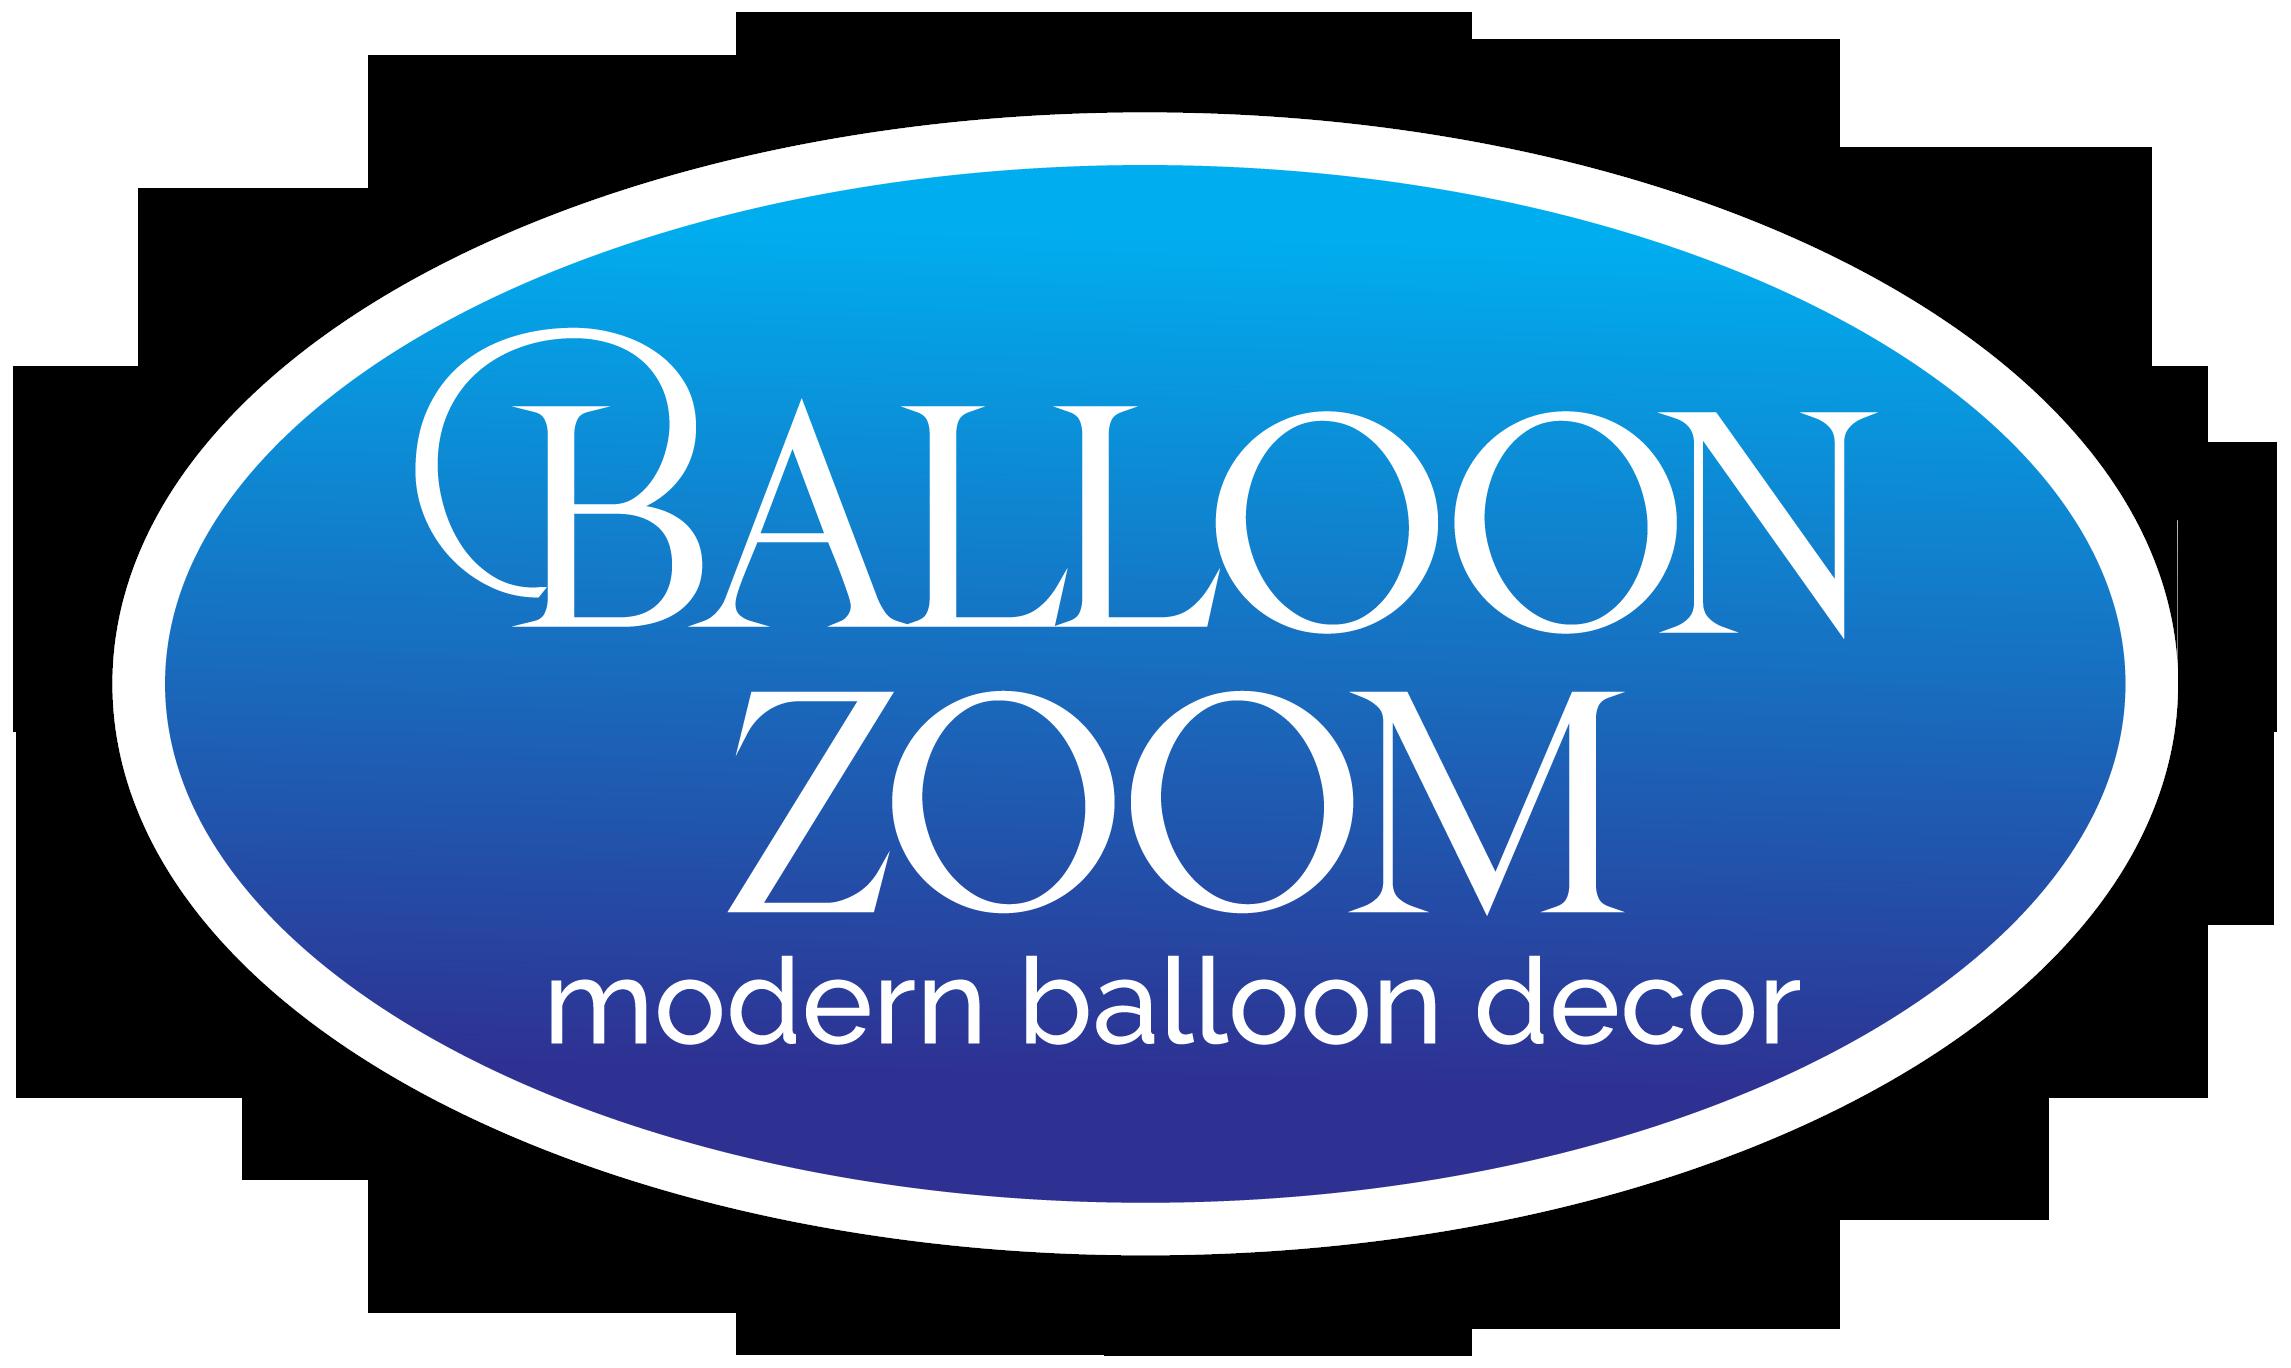 Balloon Zoom